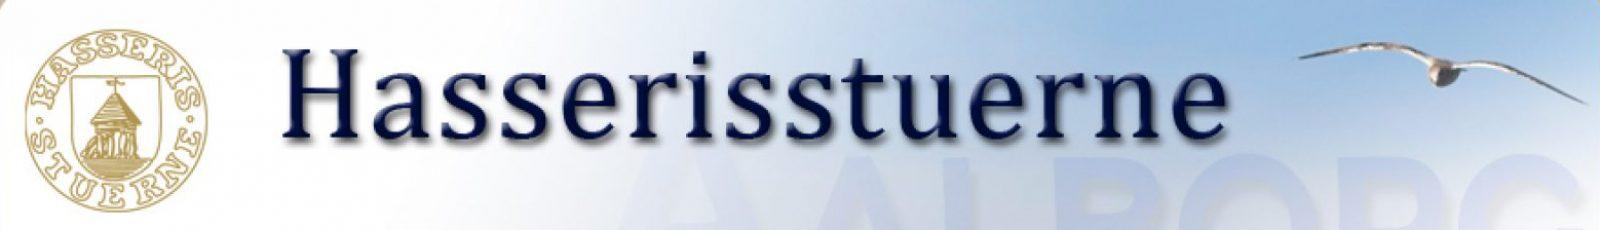 Museumsforeningen Hasserisstuerne